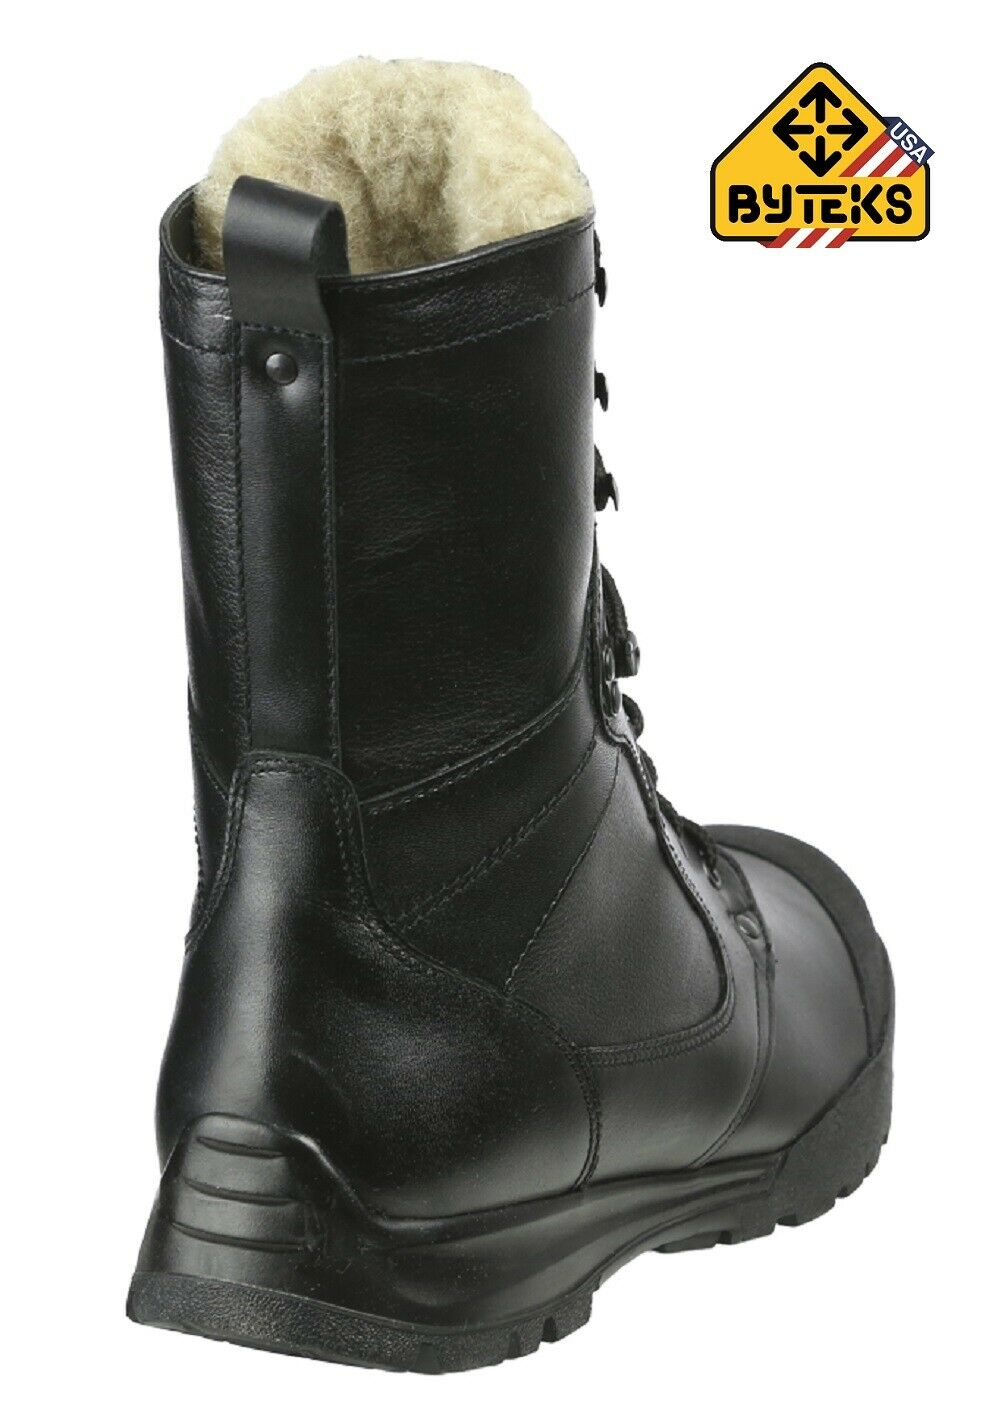 "Authentic Soviet SpetsNaz Assault Tactical Boots /""Peregrine 5022/"" by BYTEKS"